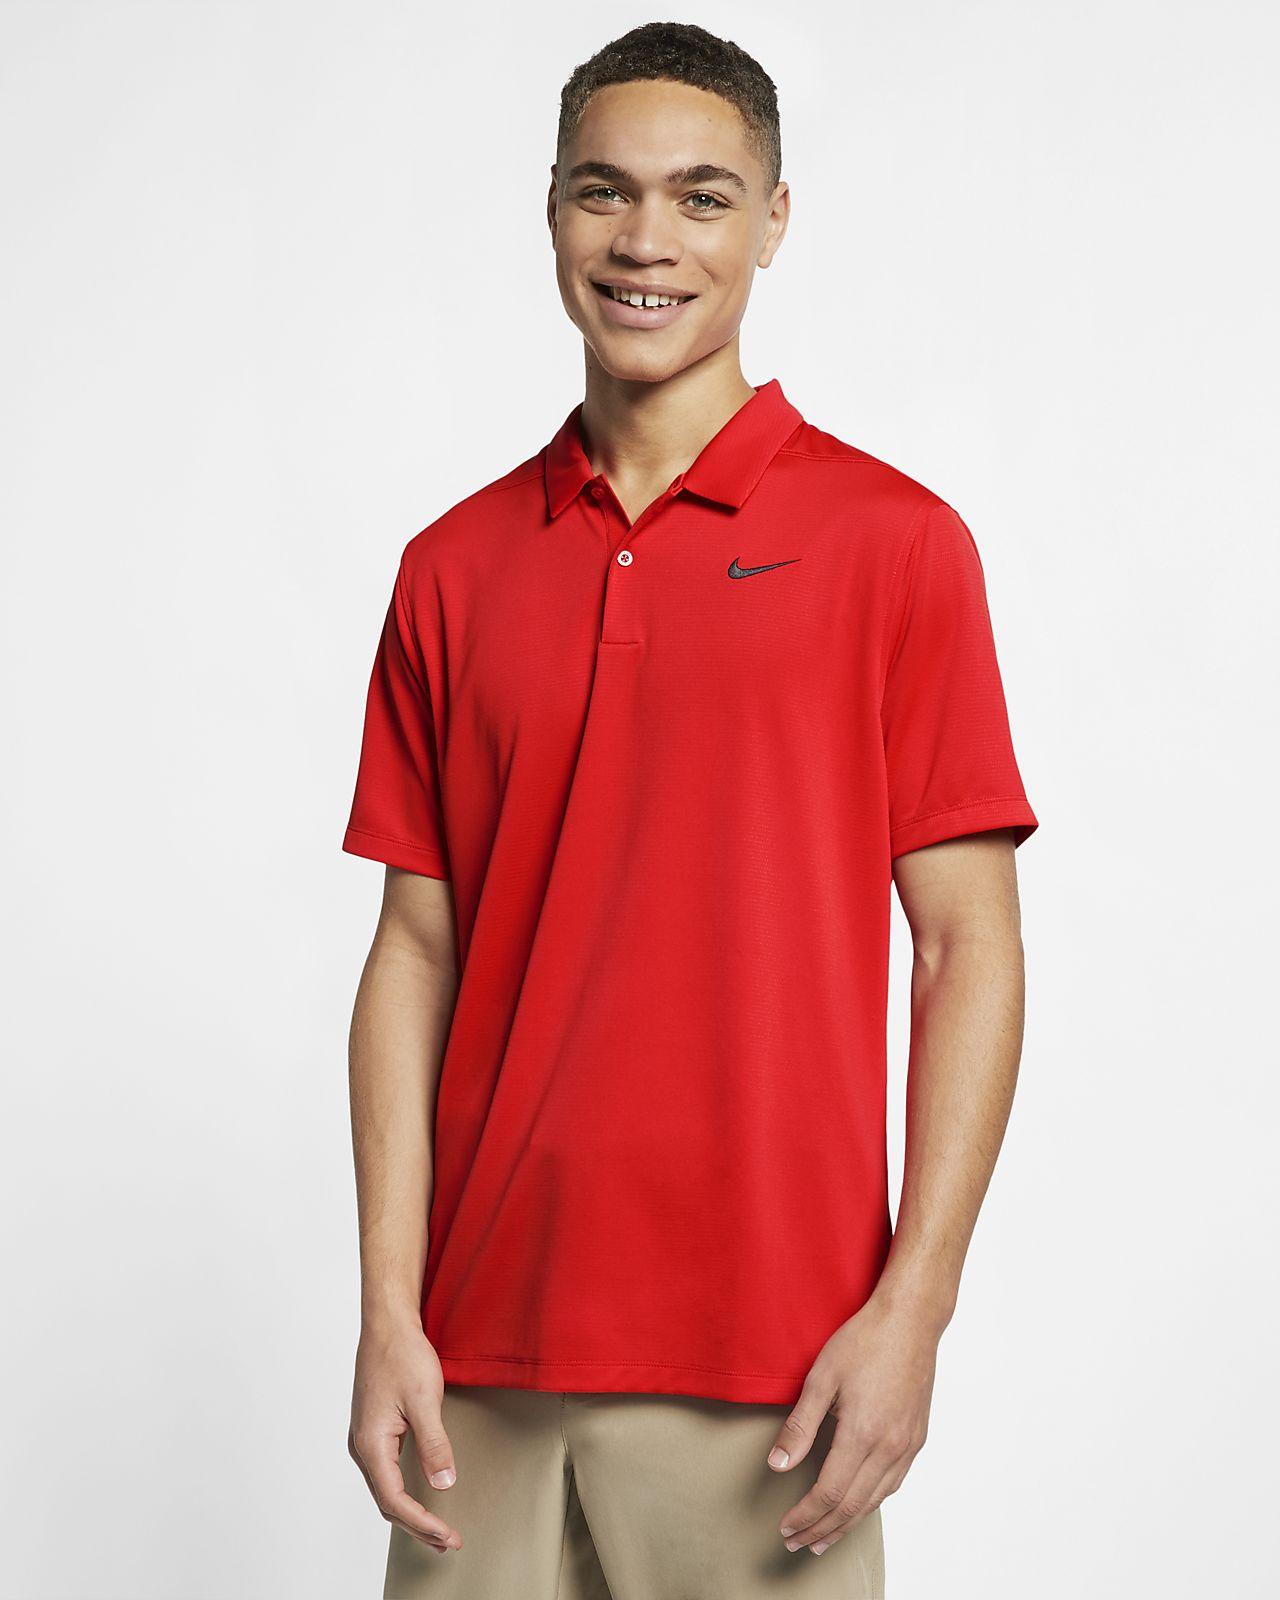 Polo de golf para hombre Nike Dri-FIT